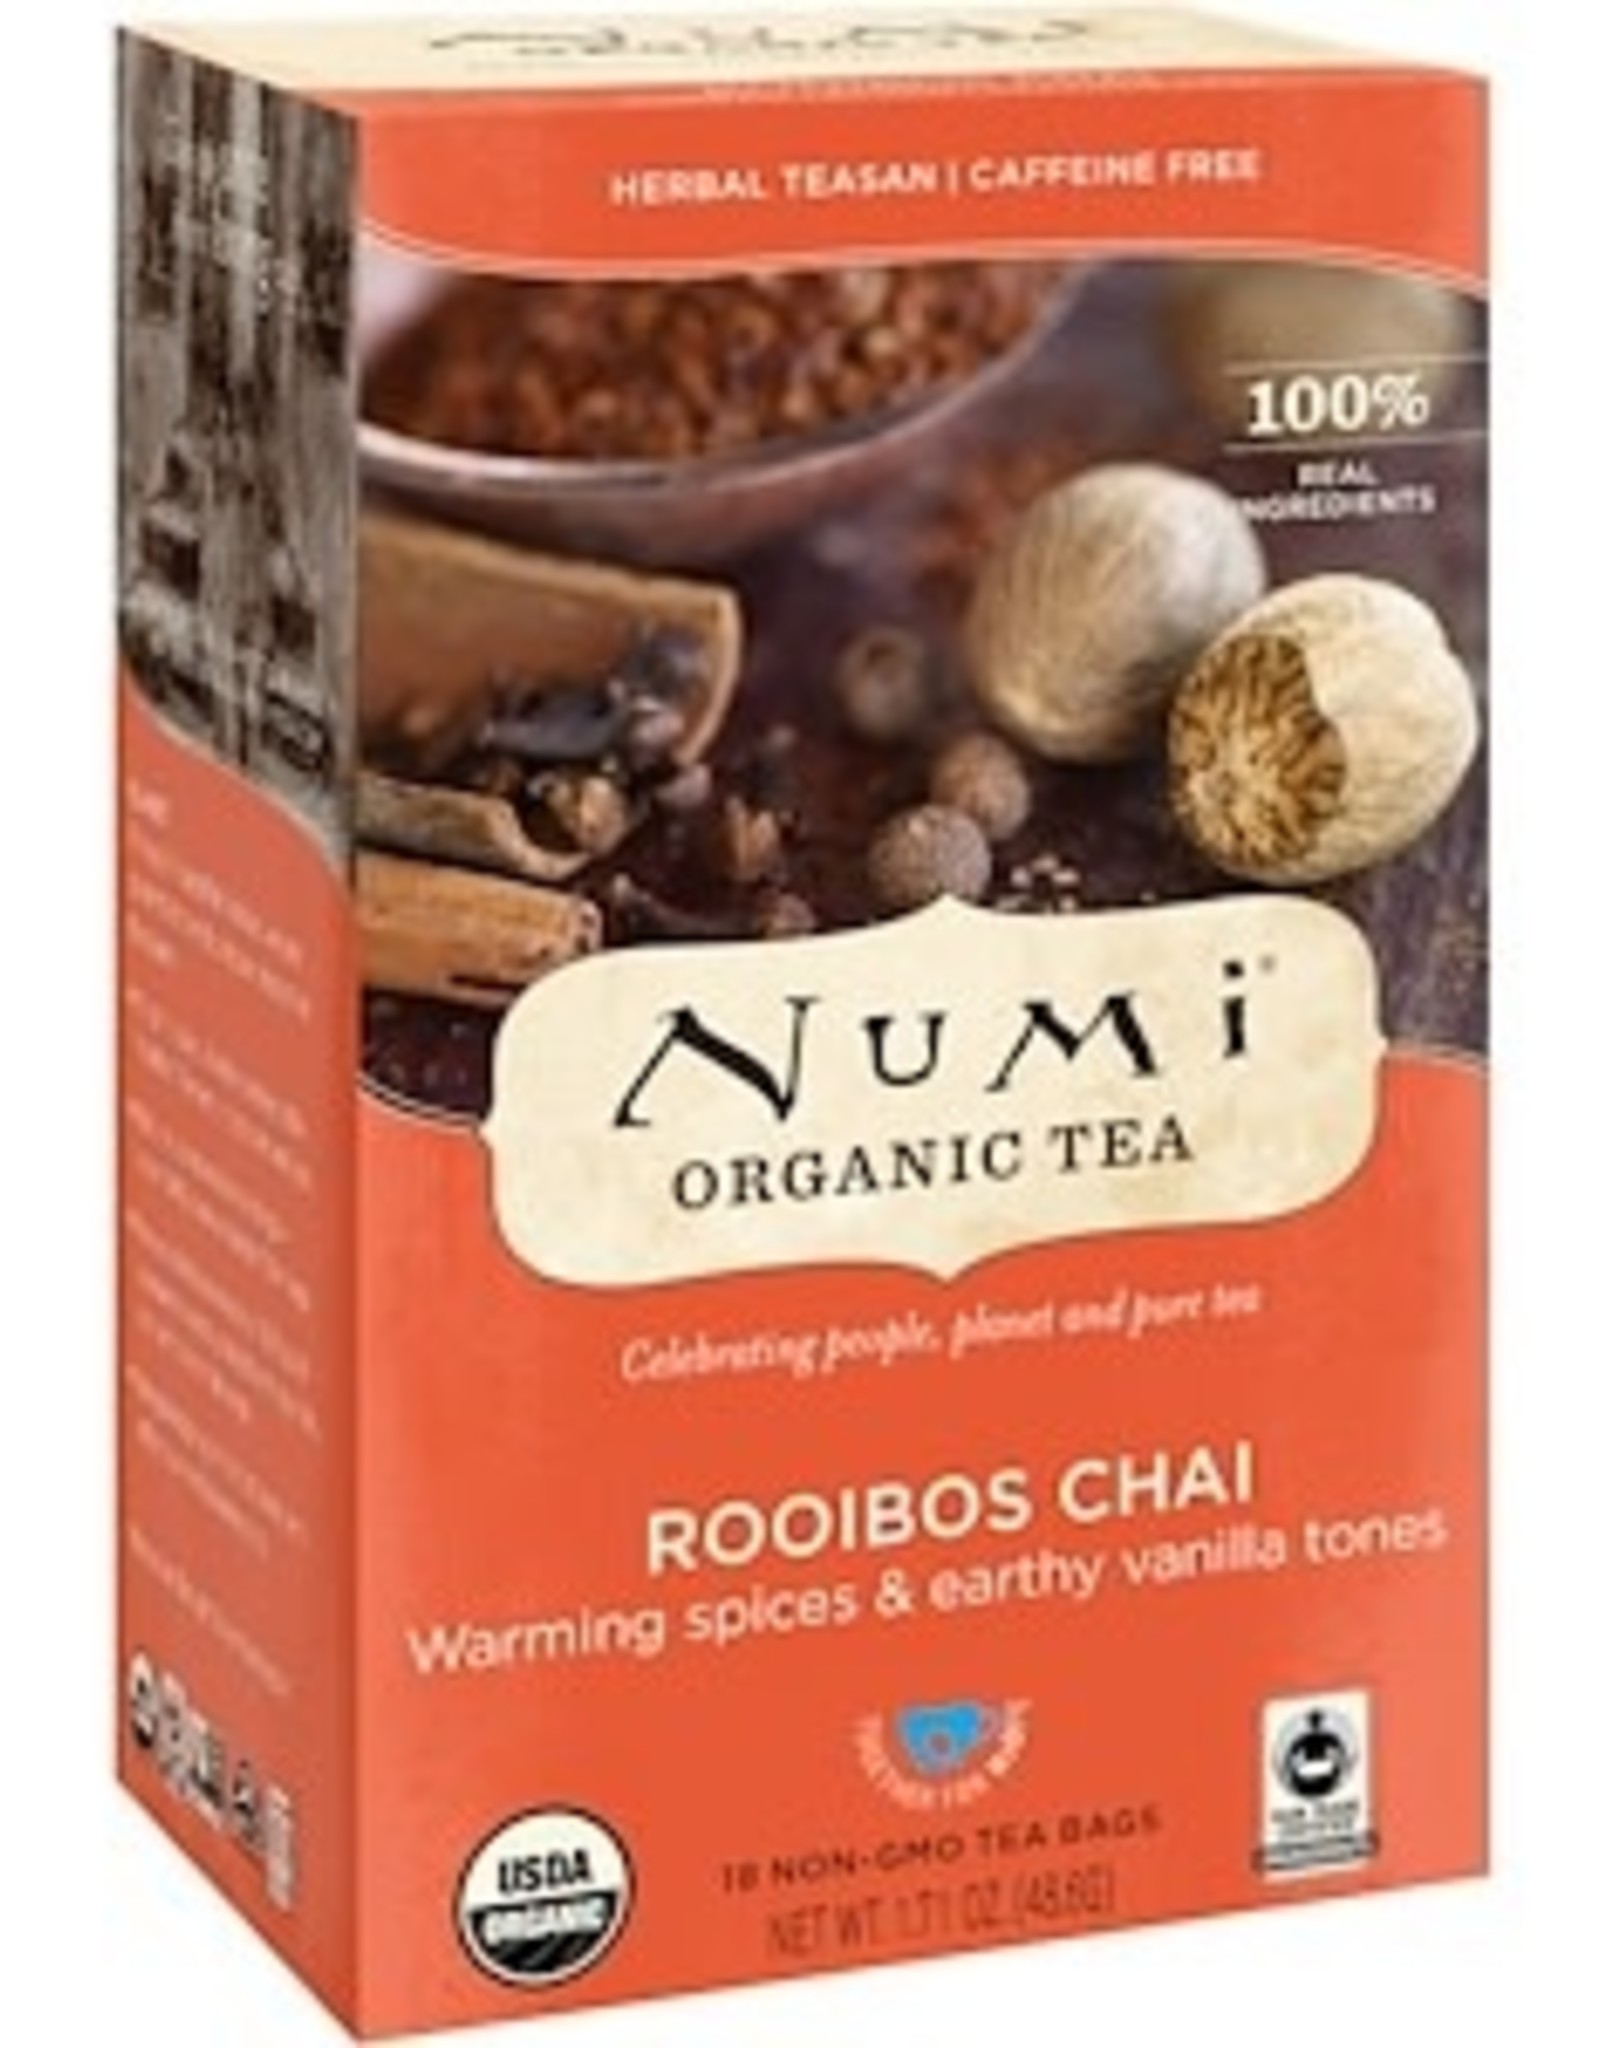 Numi Organic Tea-Rooibos Chai 18 ct